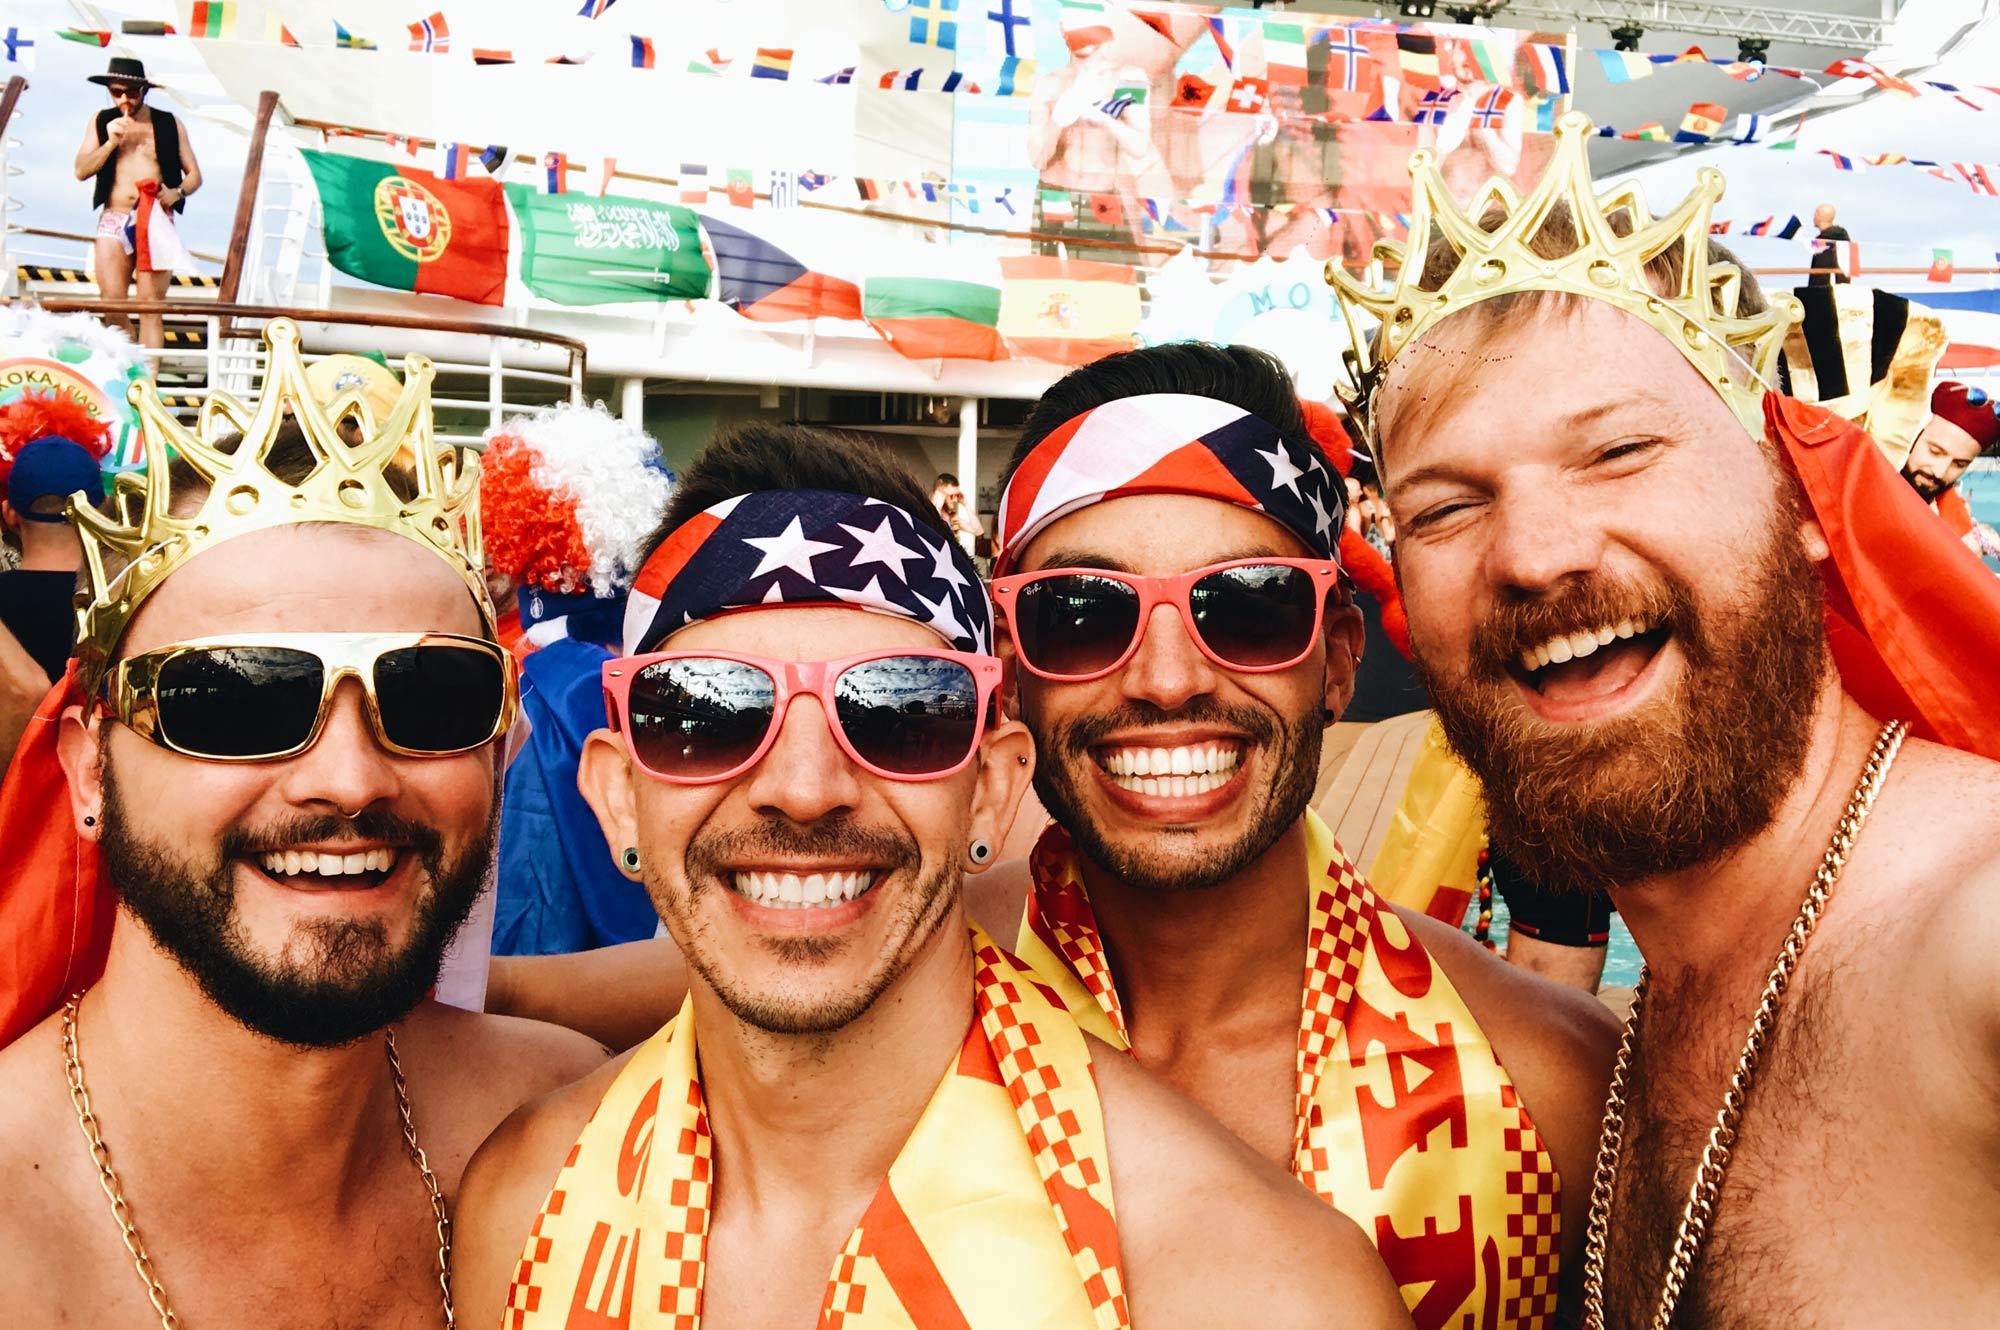 gay incontri online Belgio Creed incontri Gottesdienst